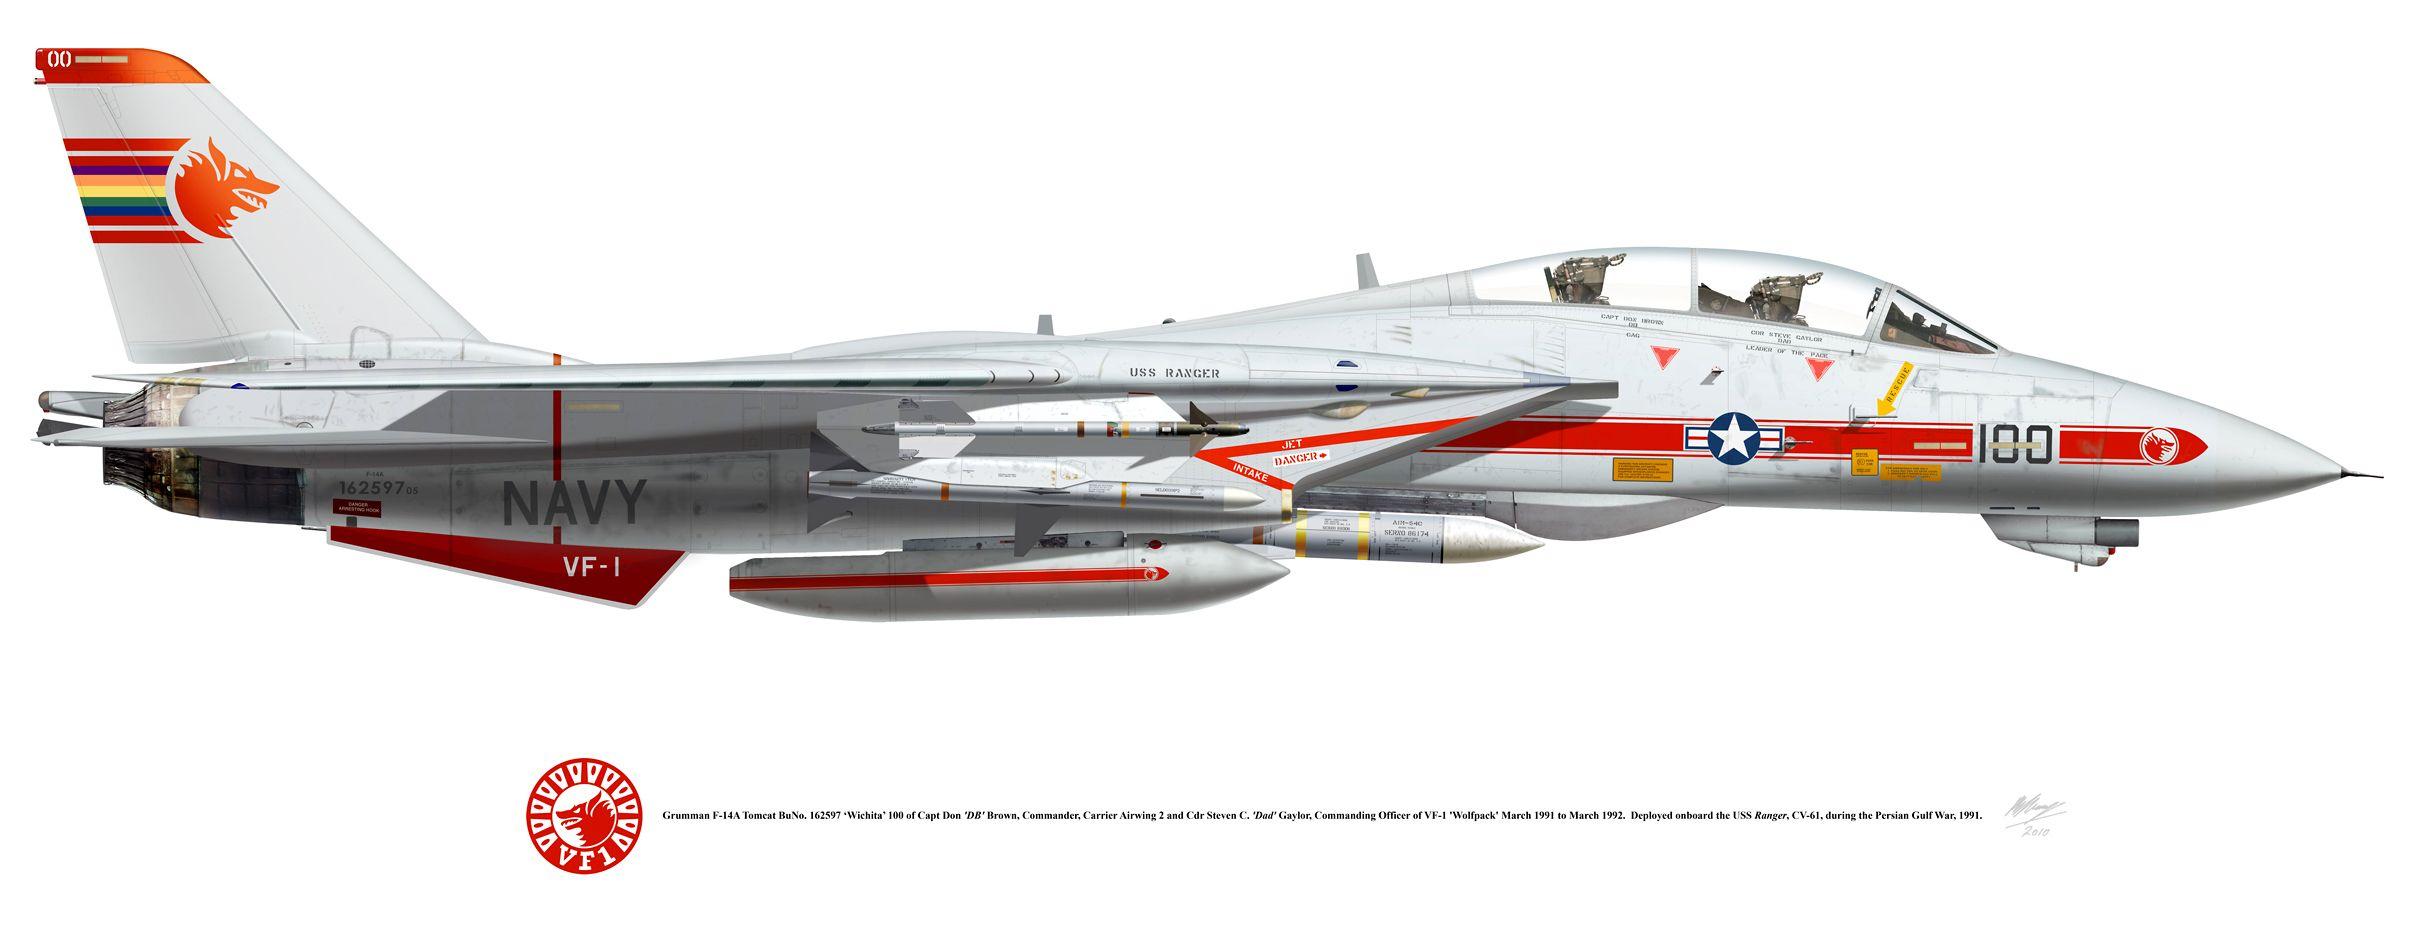 Flugzeug Profile 61 Grumman F1 Tomcat Flugzeug-Modellbau//Bilder//Fotos//Jäger//USA